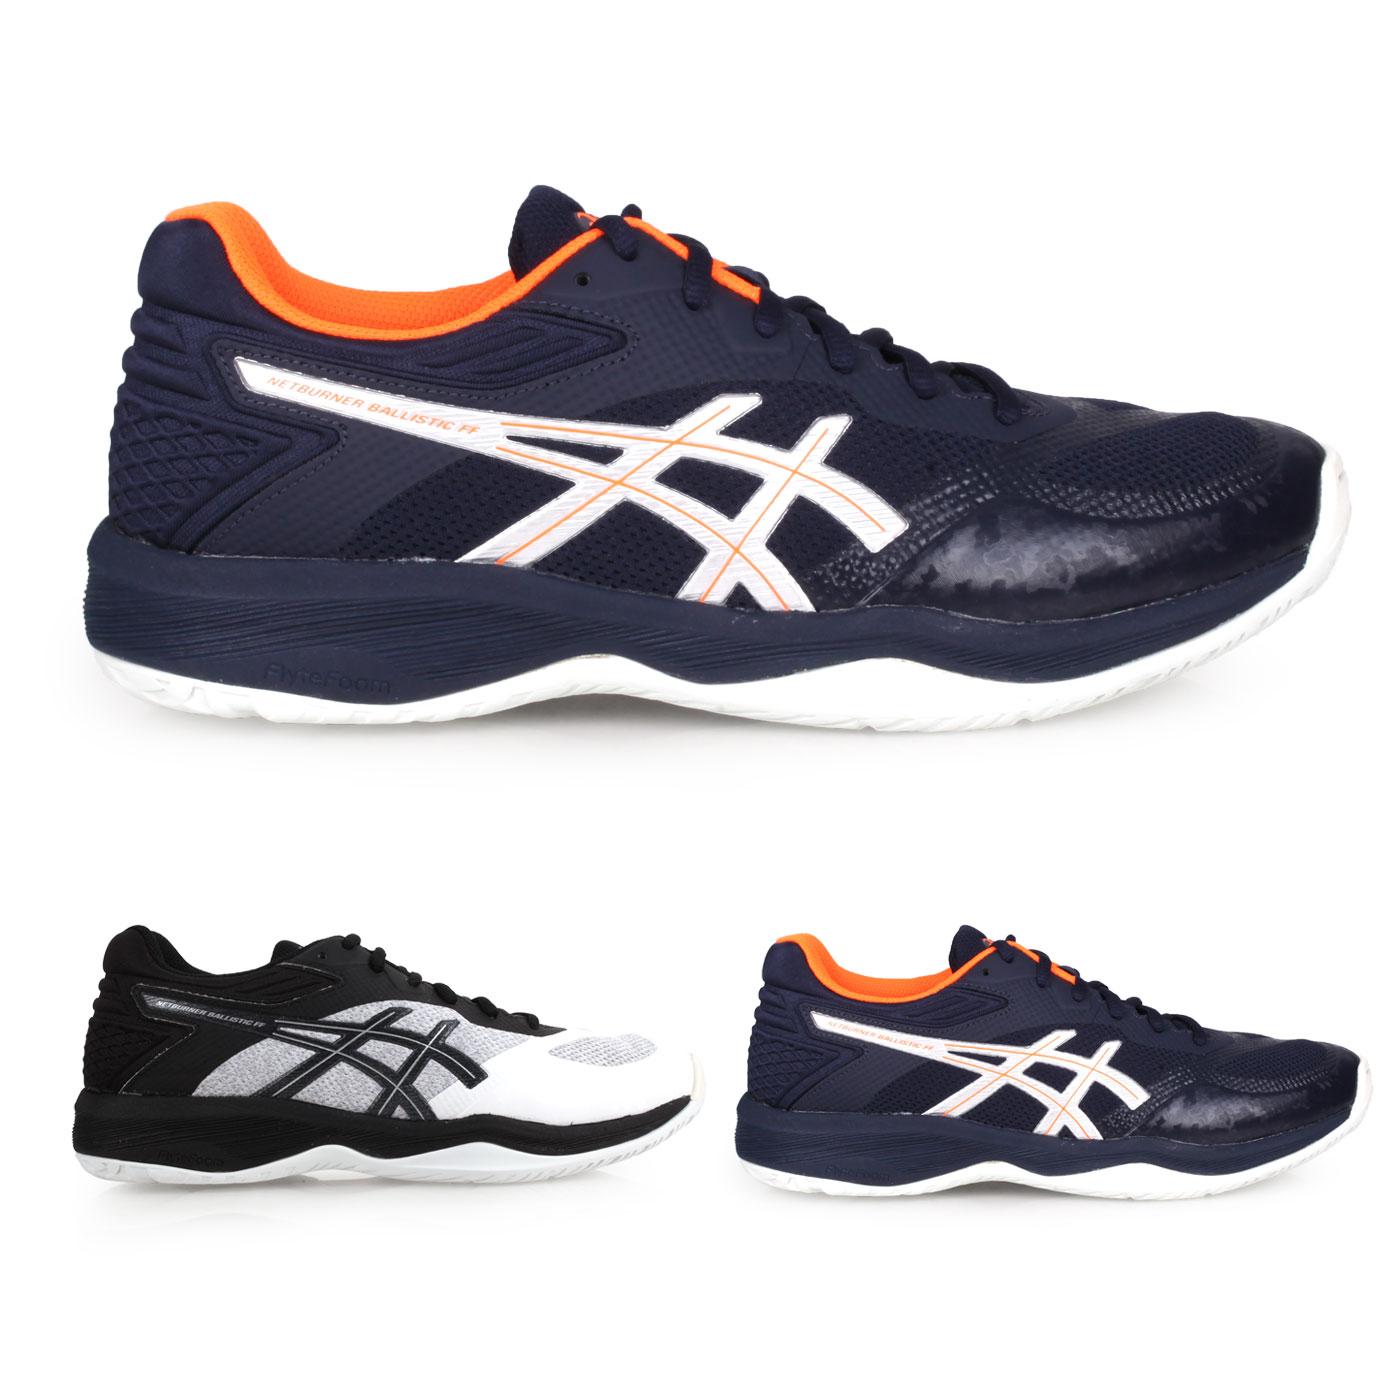 ASICS 排羽球鞋  @NETBURNER BALLISTIC FF@1051A002-100